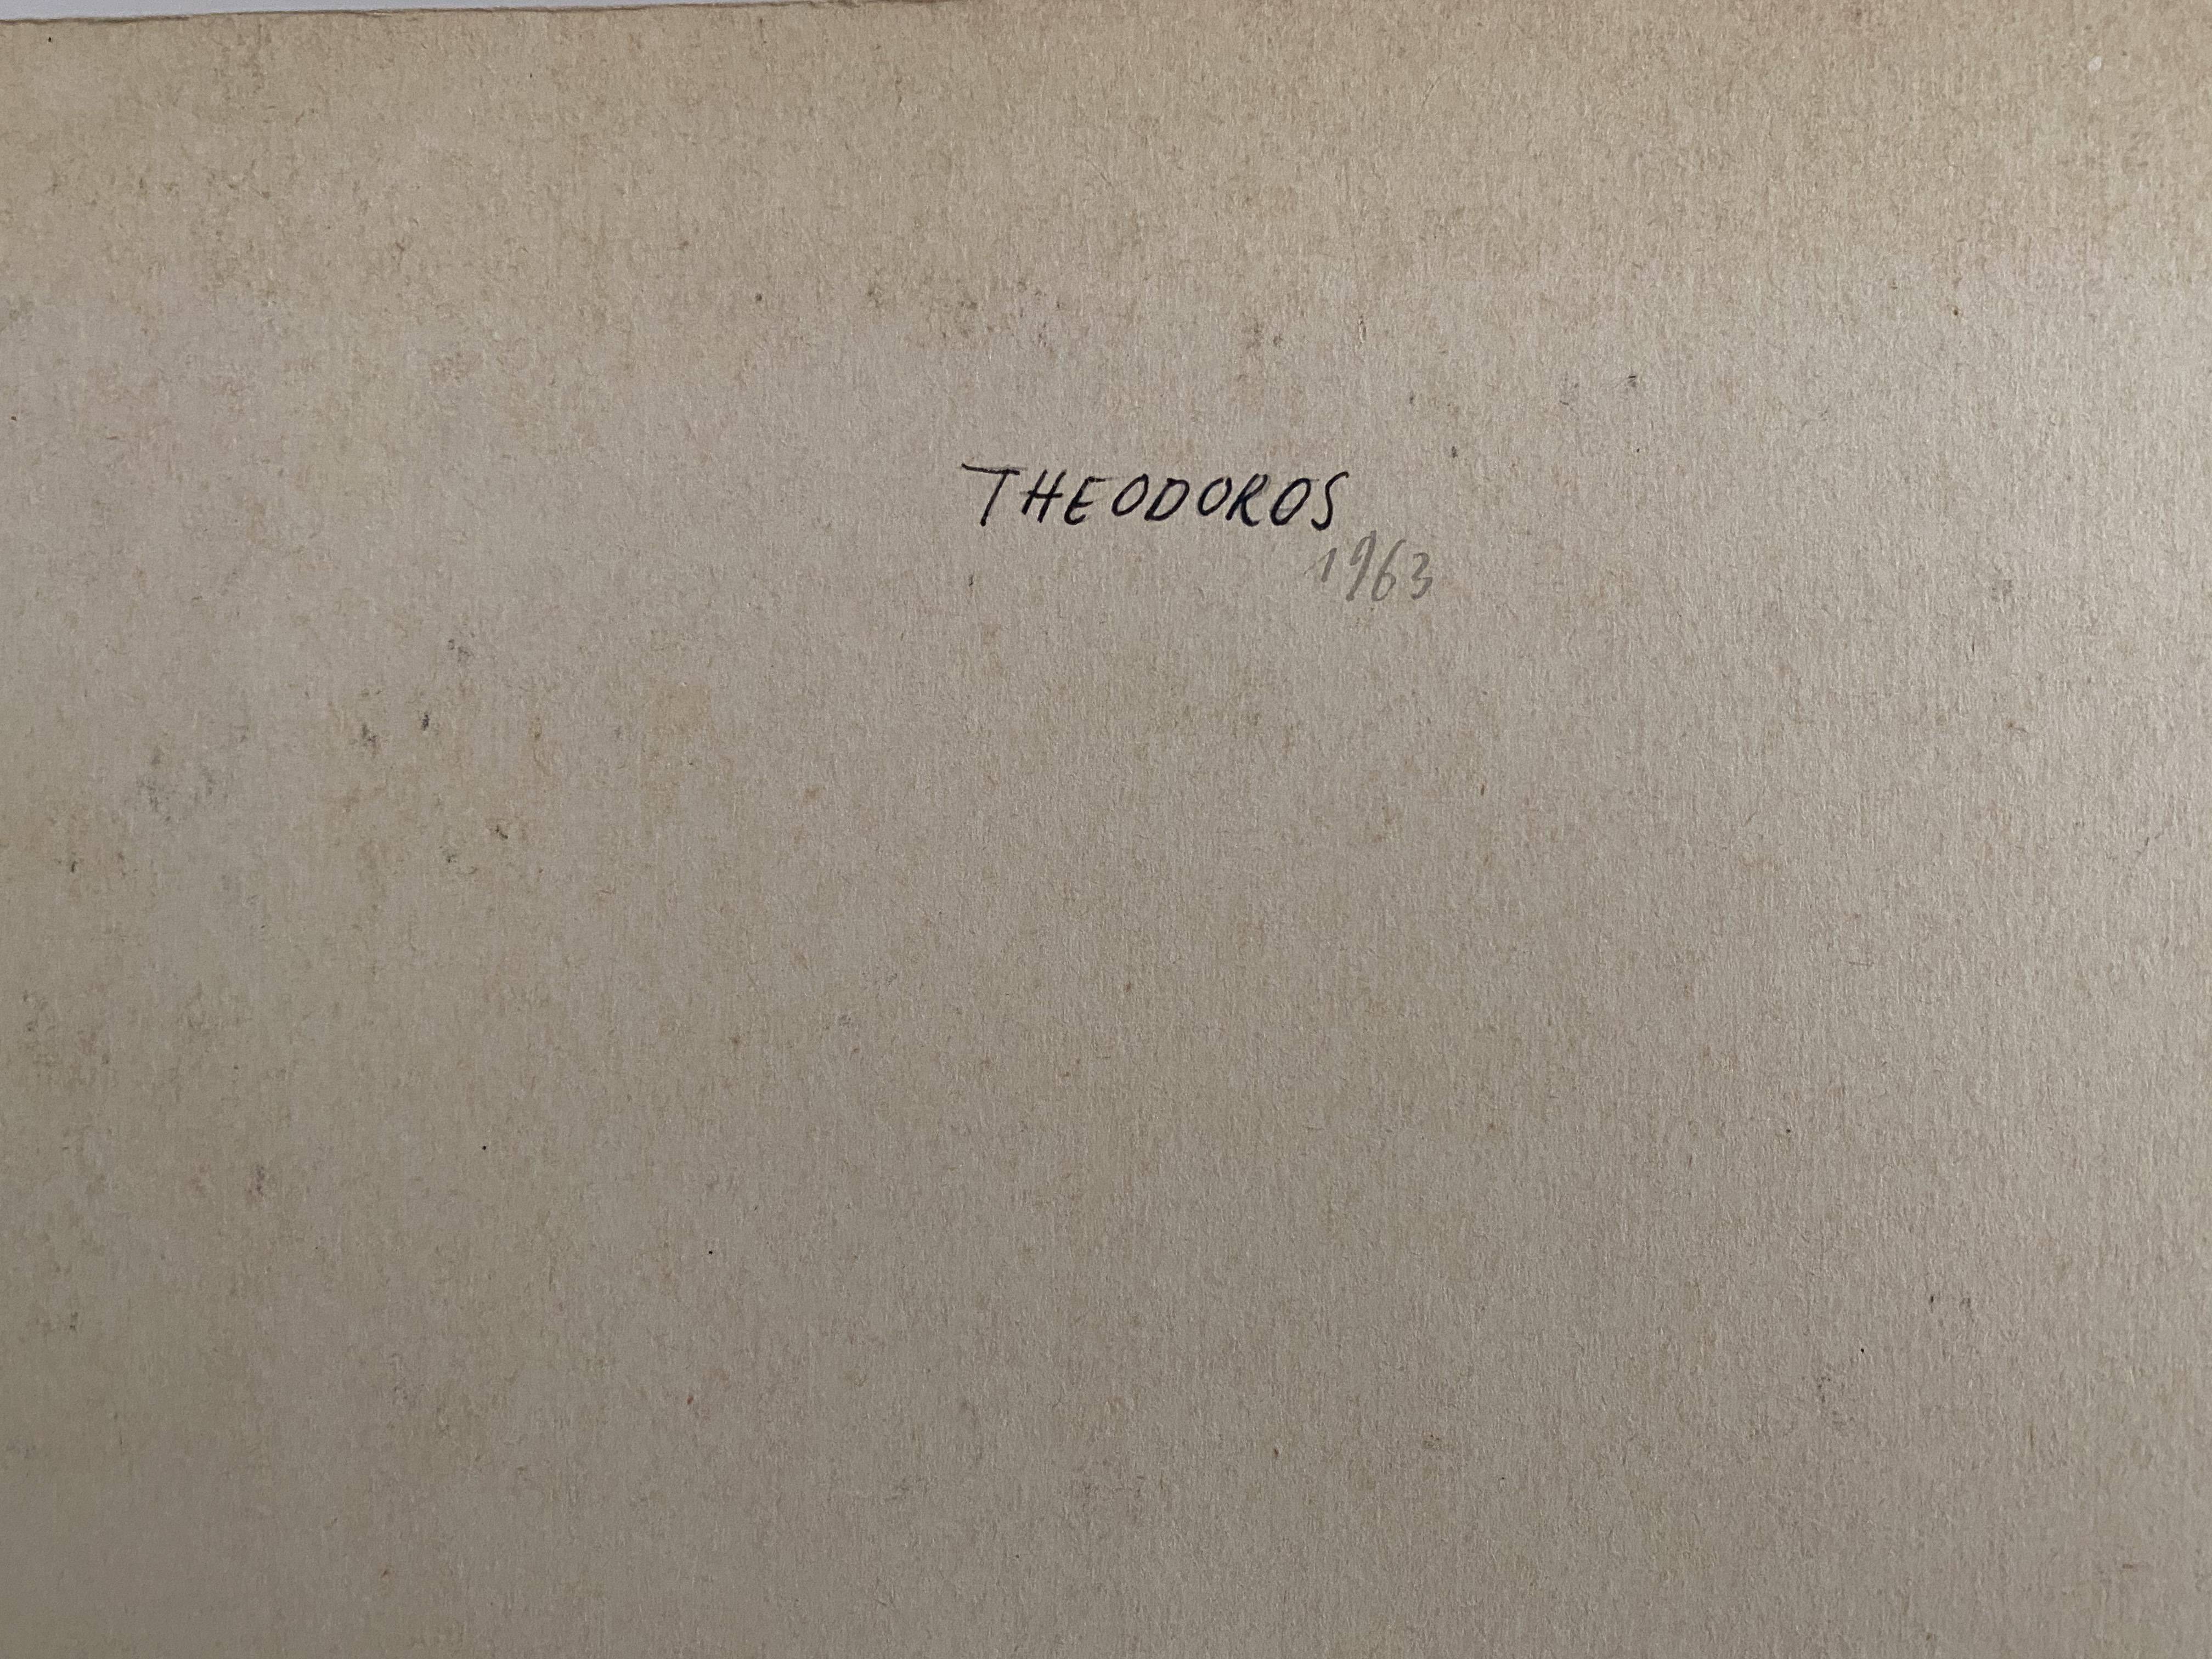 Theodoros (Papadimitriou) (Greek, 1931-2018) (AR), untitled, 1963, acrylic on paper, 35.5 x 49.5 cm. - Image 2 of 2